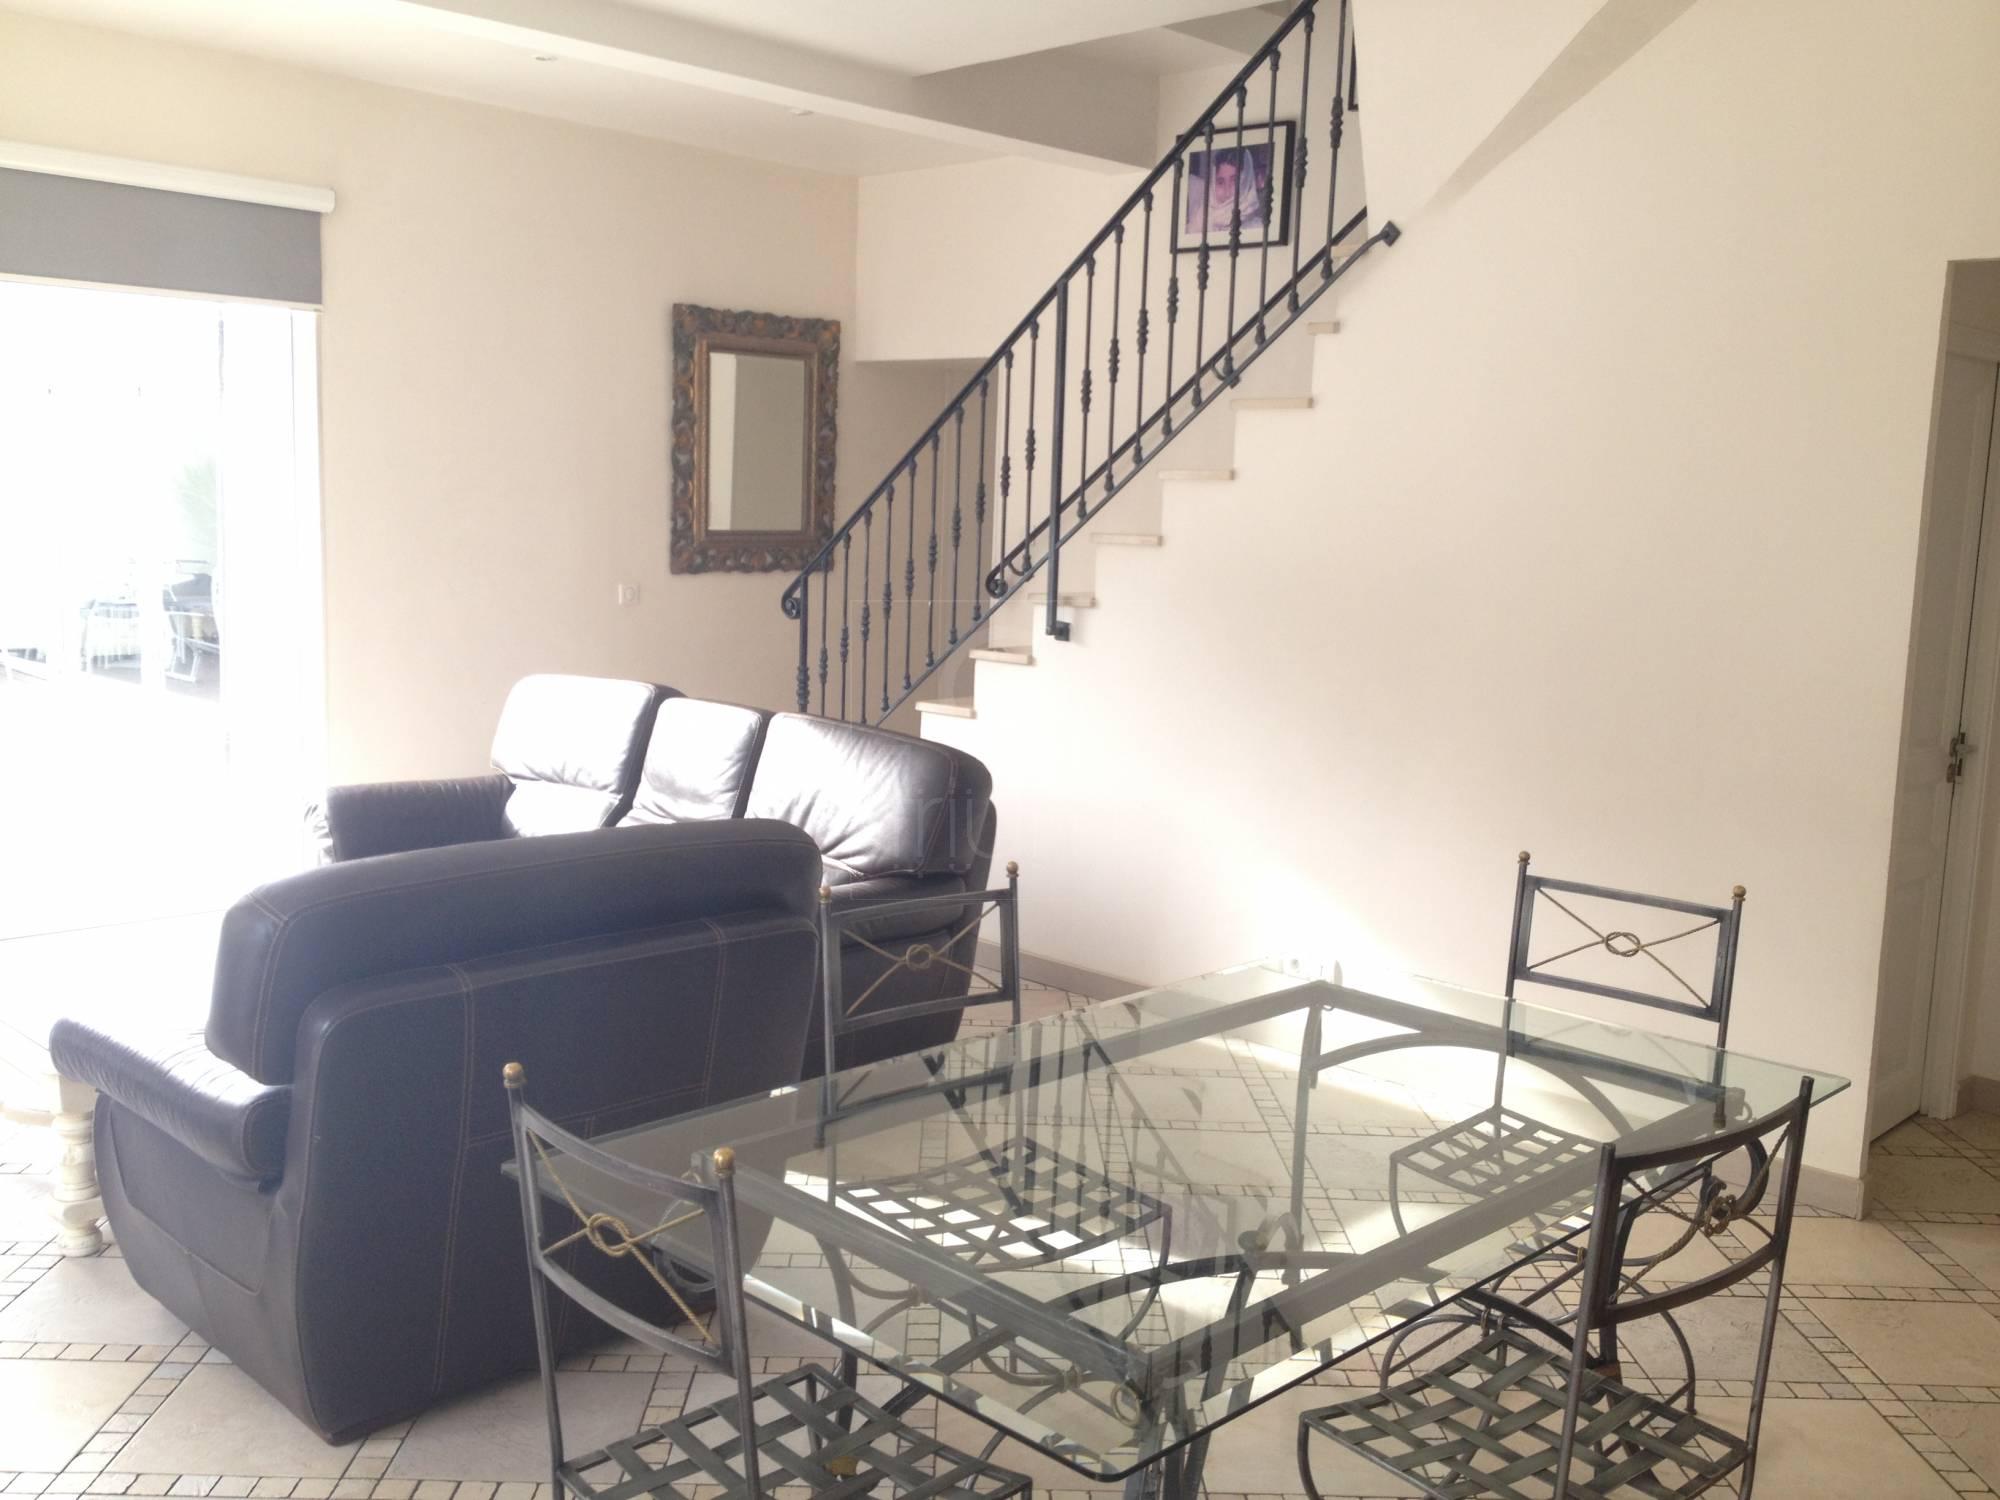 Vente appartement t5 f5 marseille 13013 la cordaire agence for Vente appartement marseille